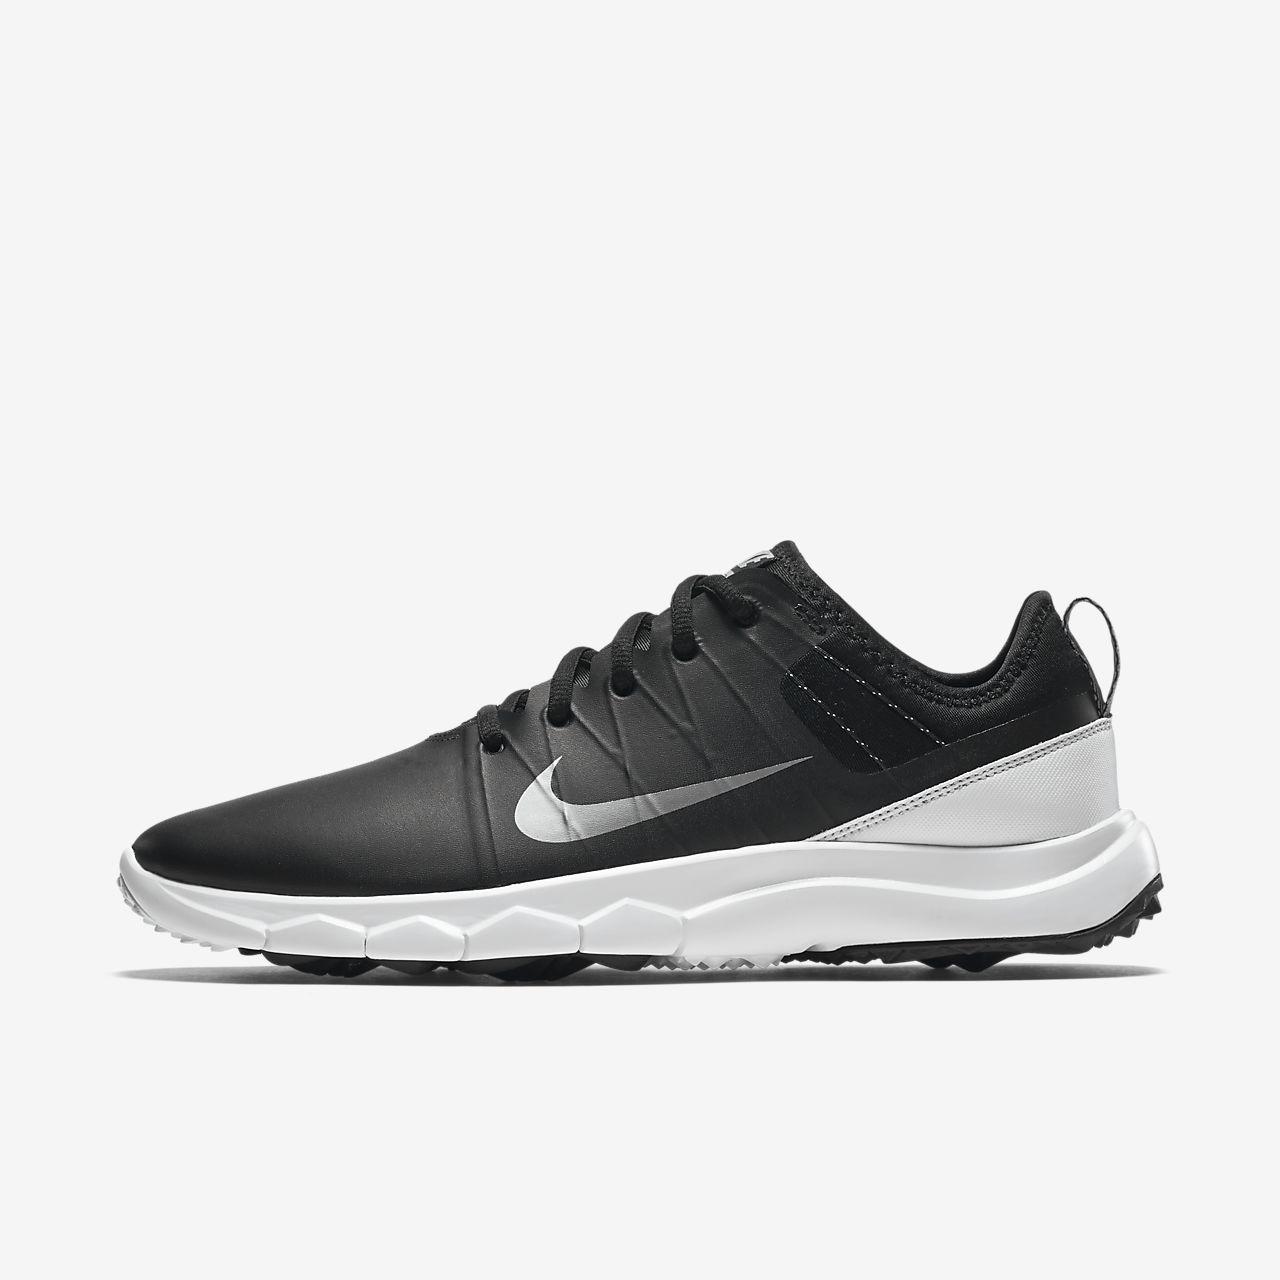 timeless design c2642 2f0fa Nike FI Impact 2 Zapatillas de golf - Mujer